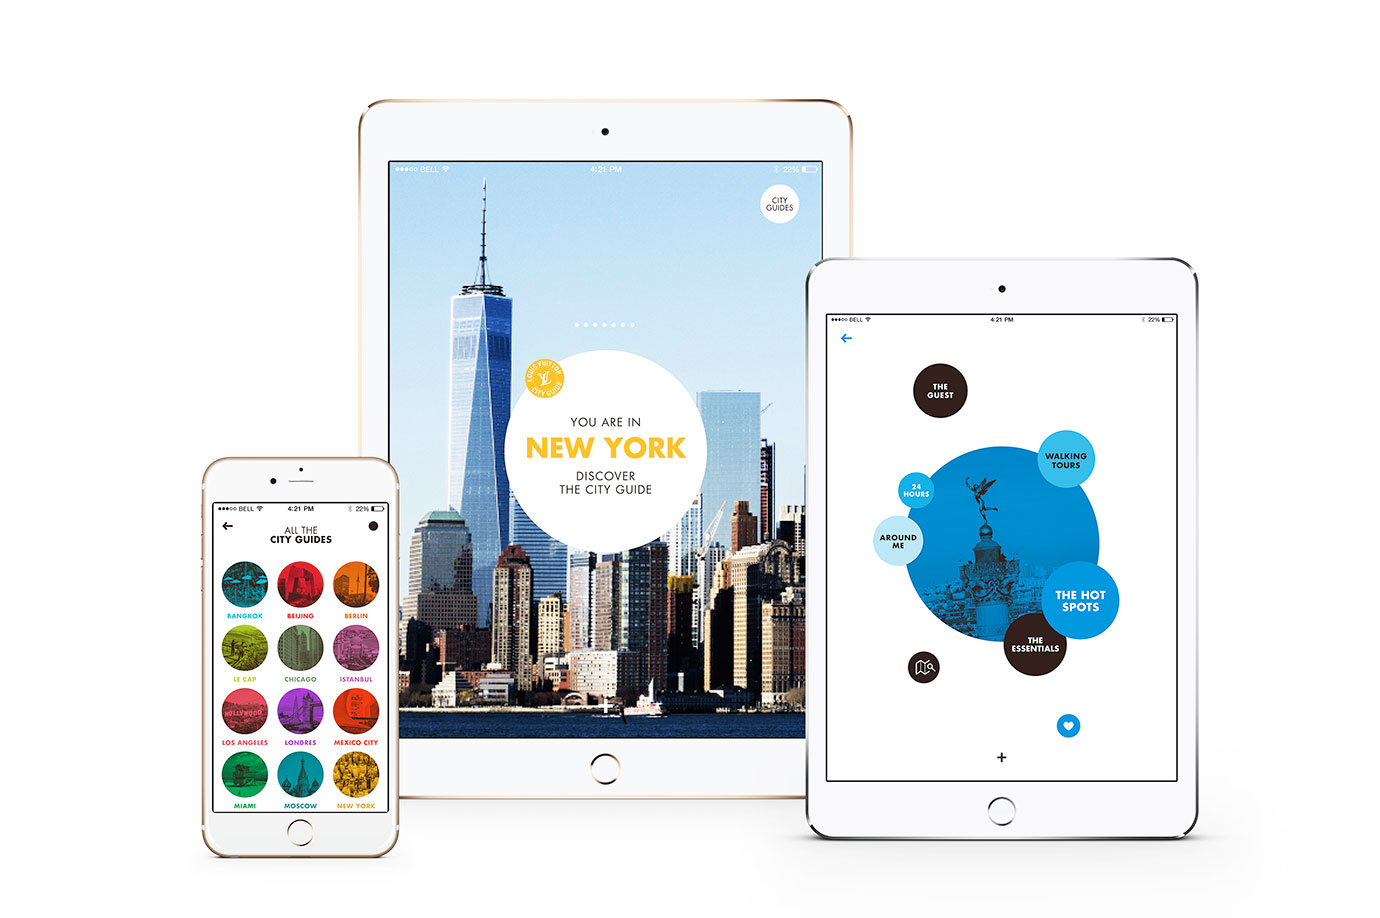 Louis Vuitton Takes Its Travel Guides to iOS